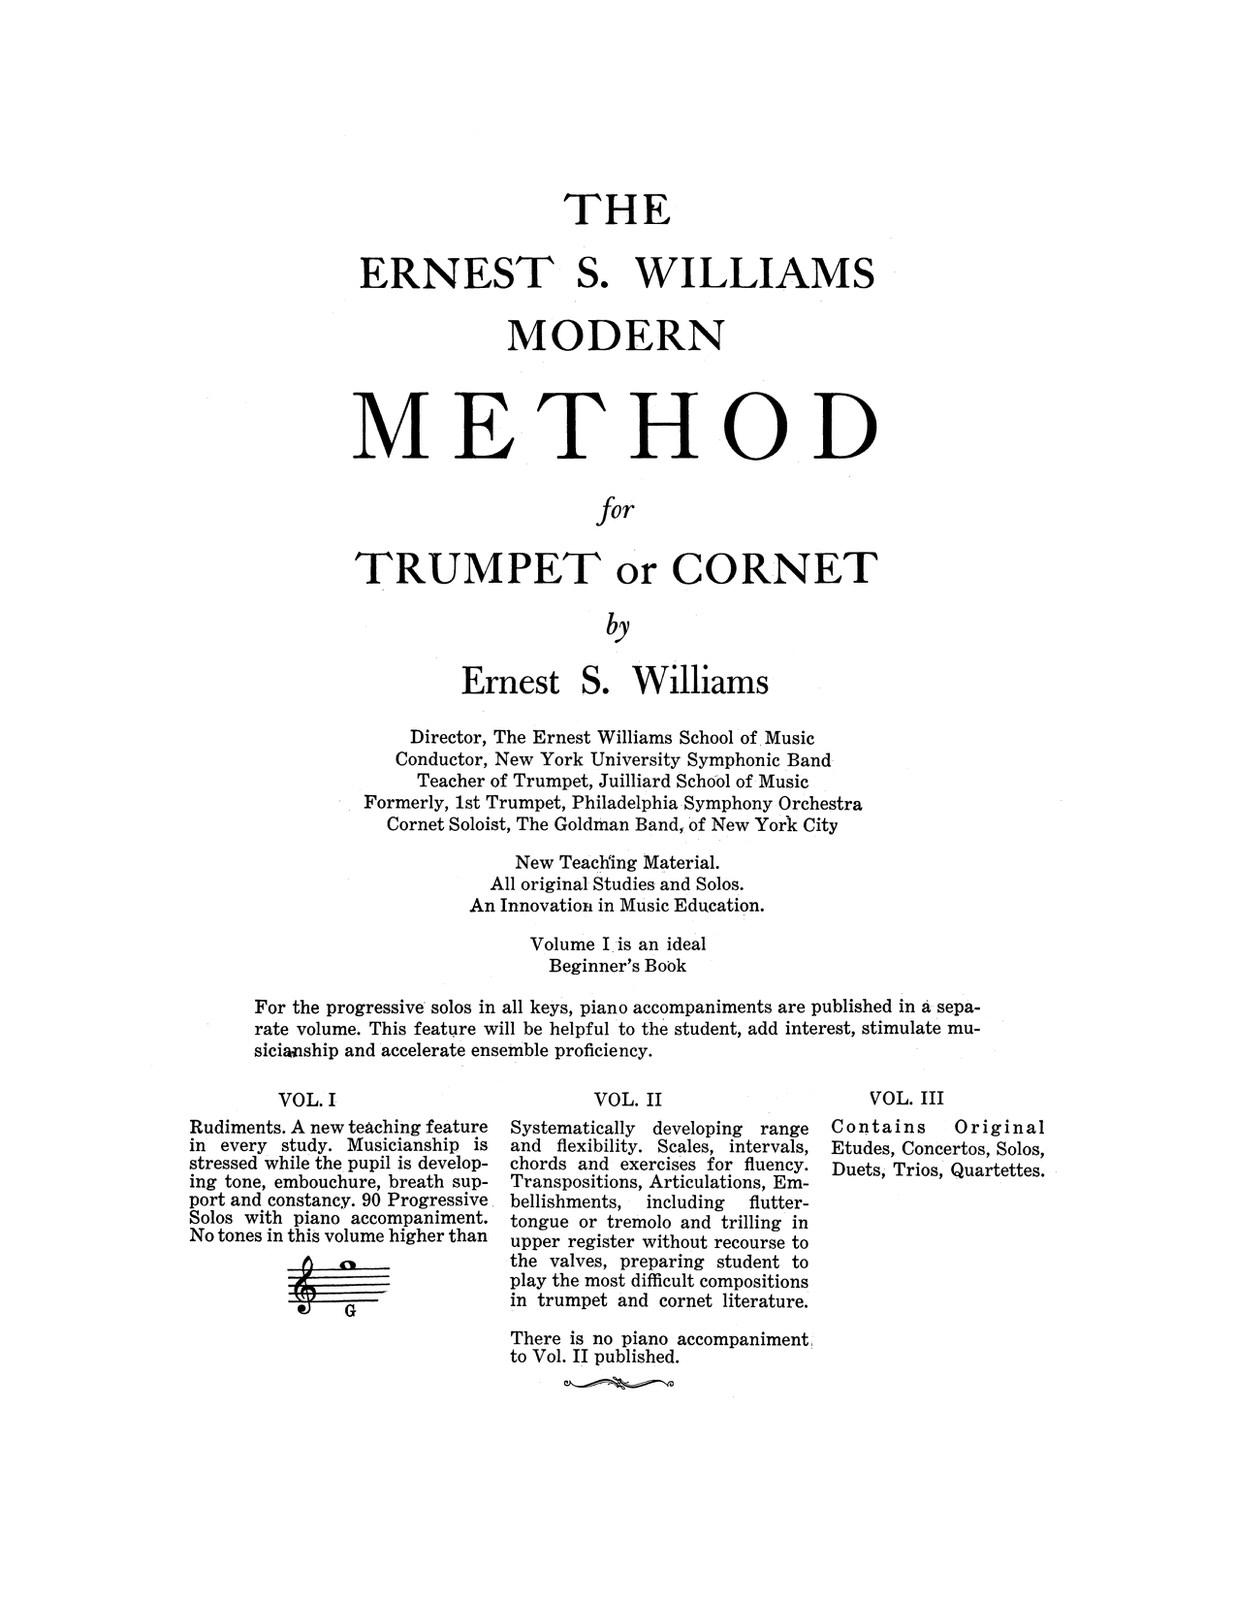 Williams, Modern Method for Trumpet or Cornet-p003